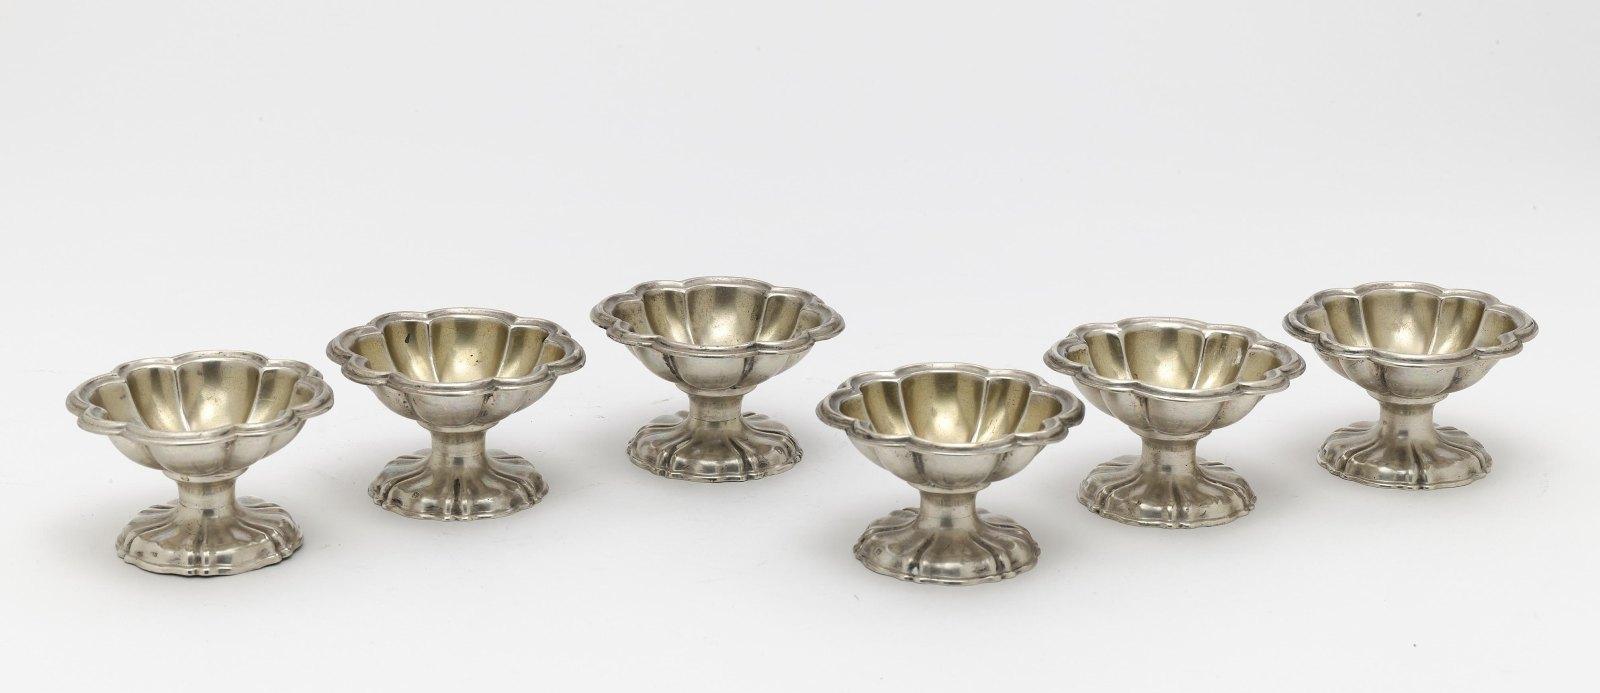 Six spice bowls